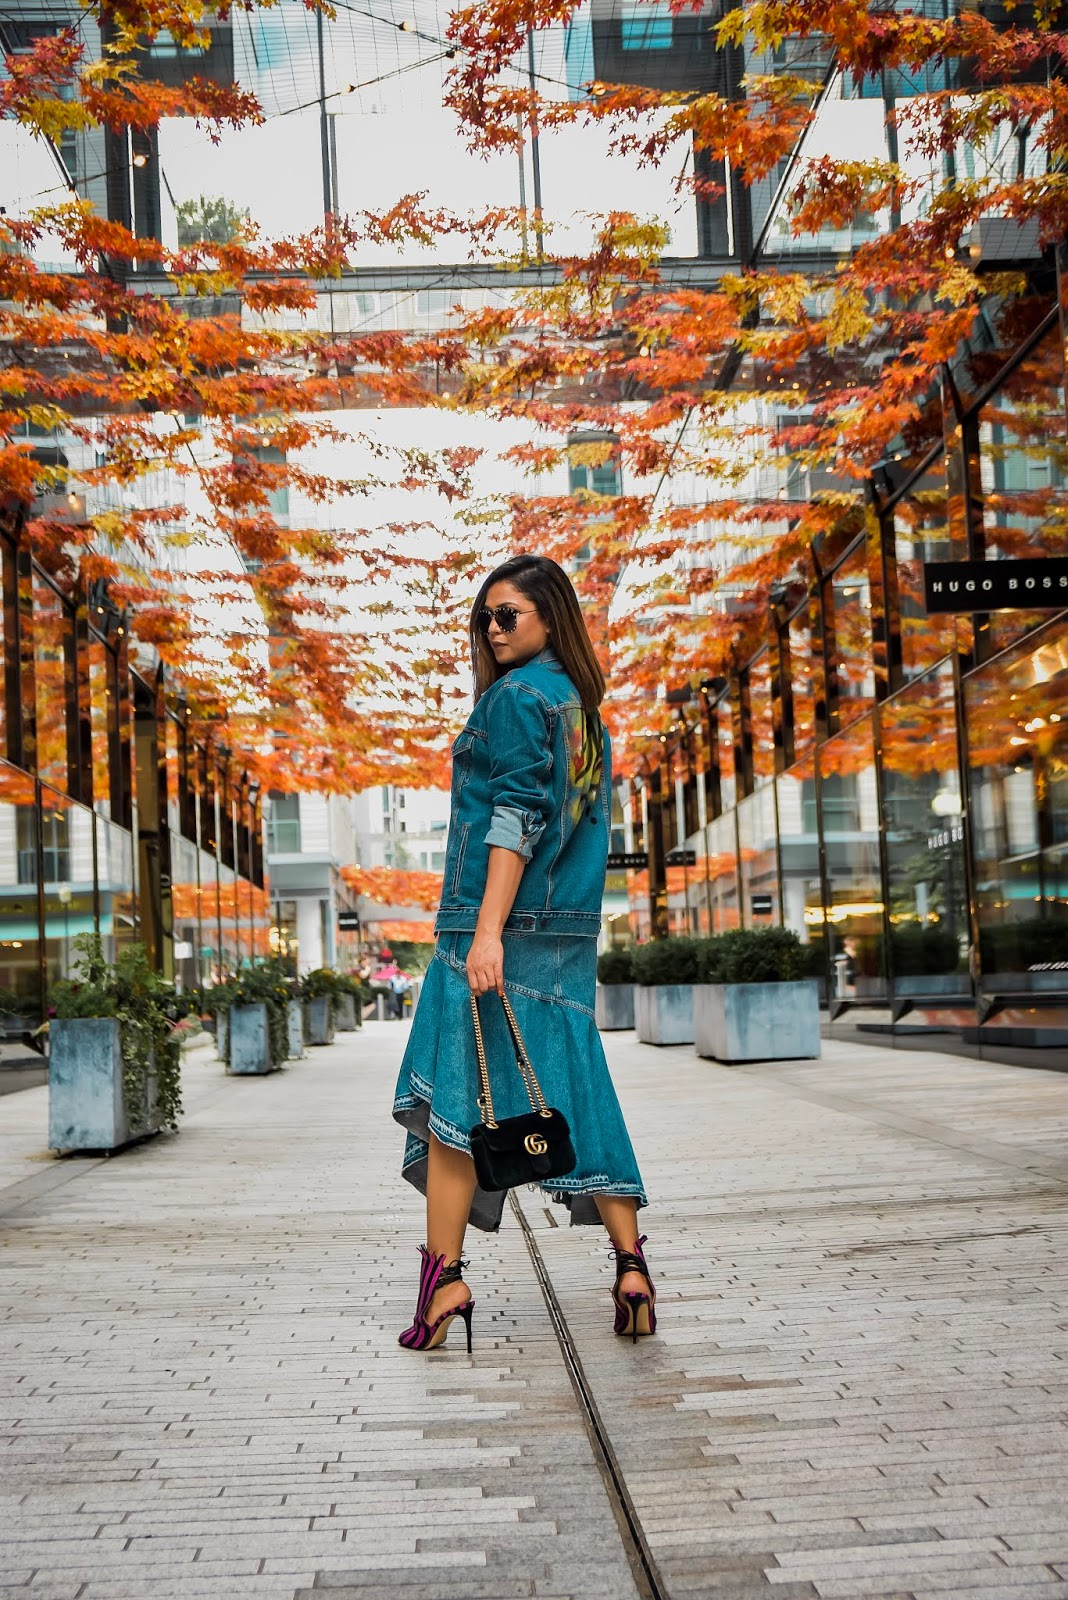 denim on denim, how to wear double denim, fashion, street style, pfw, paris fashion week, levi oversized denim jacket, moose origami skirt, myriad musings, saumya shiohare